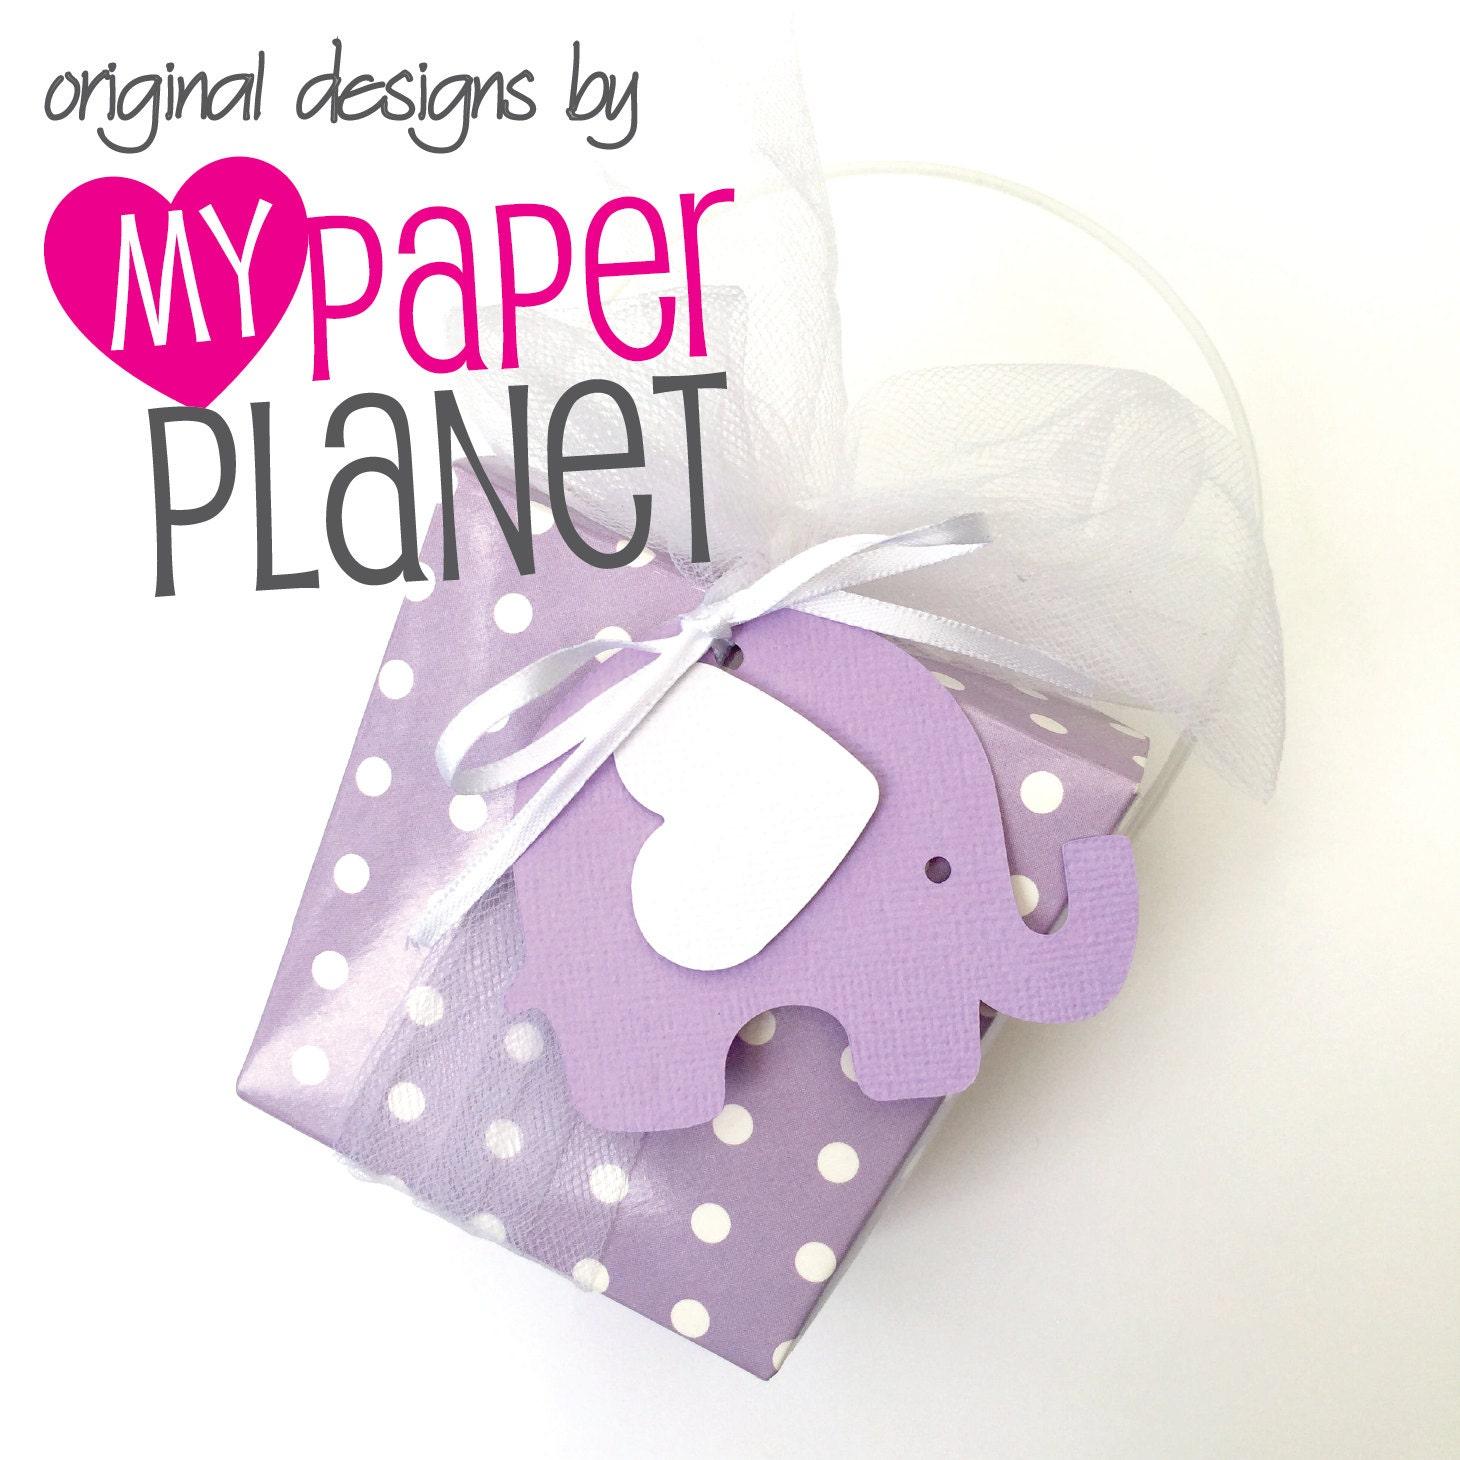 MyPaperPlanet